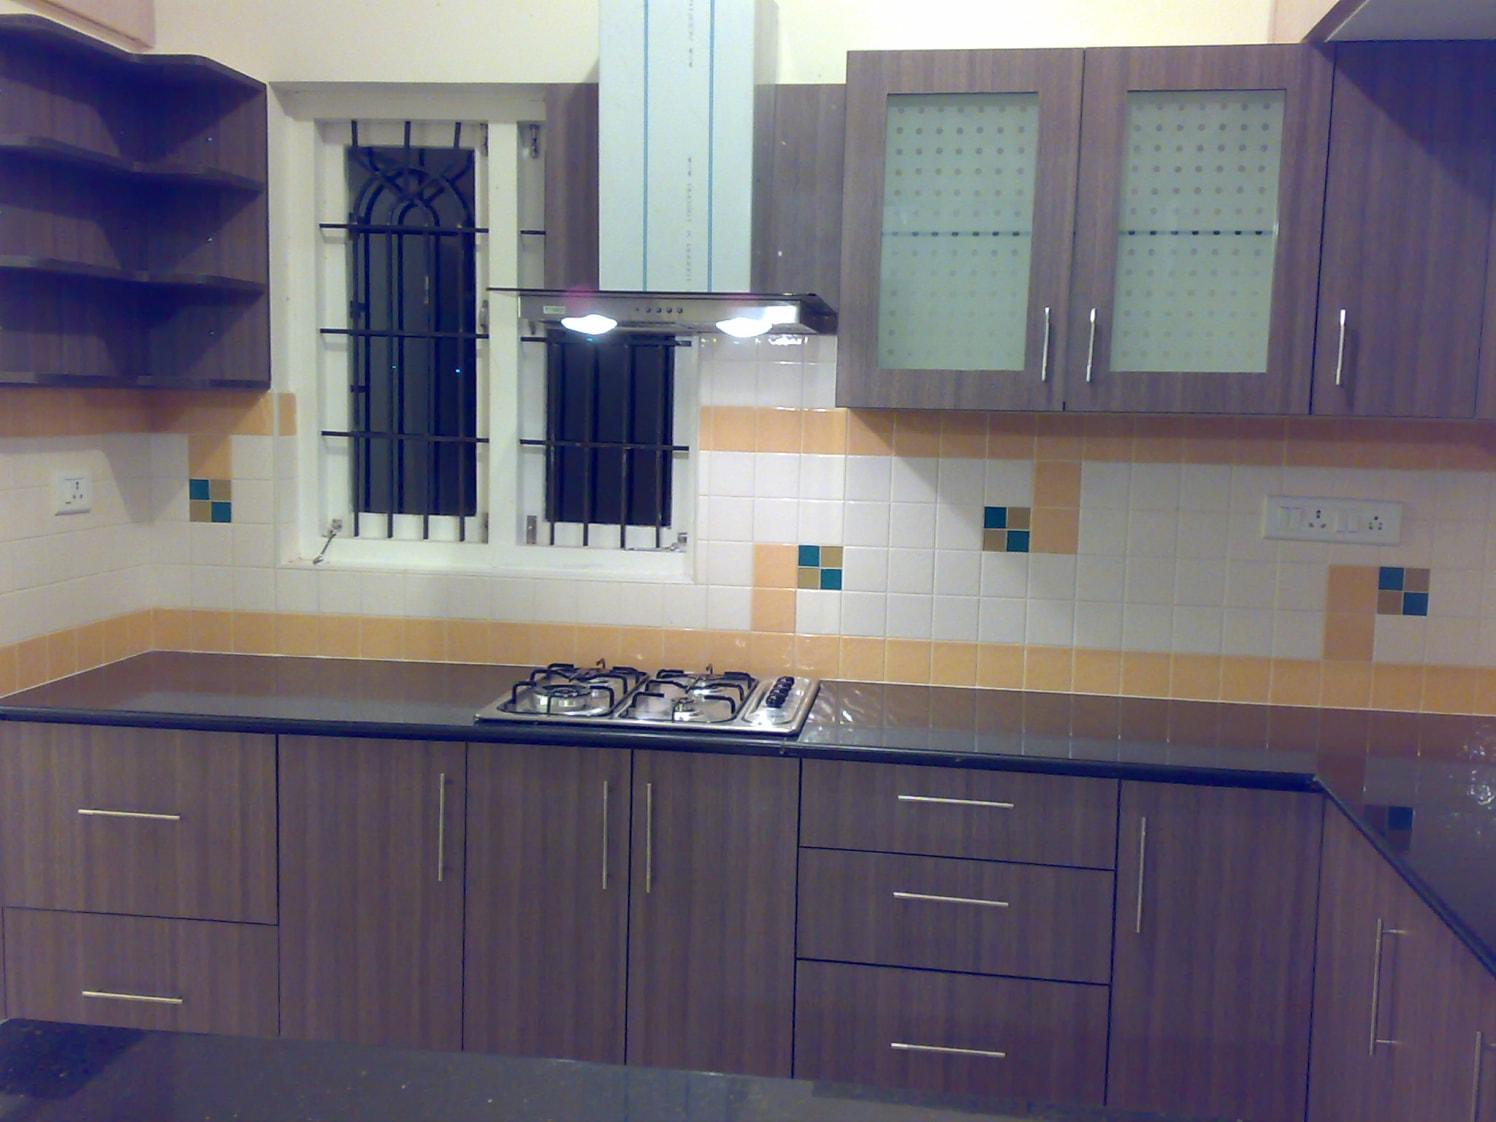 Brown Wooden Cabinets by Dhanu Nayak Modular-kitchen Contemporary | Interior Design Photos & Ideas